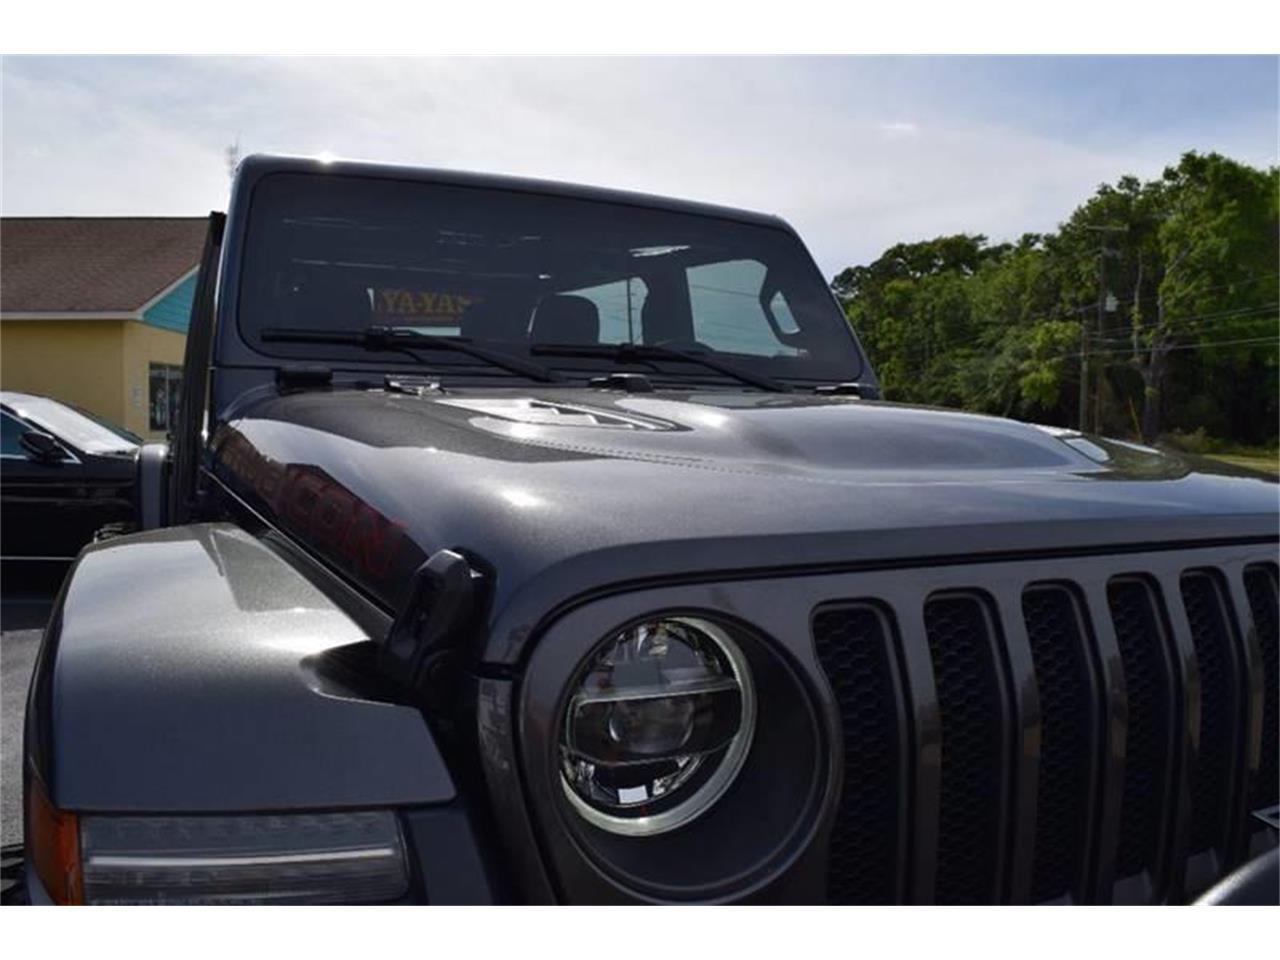 2018 Jeep Wrangler (CC-1274659) for sale in Biloxi, Mississippi